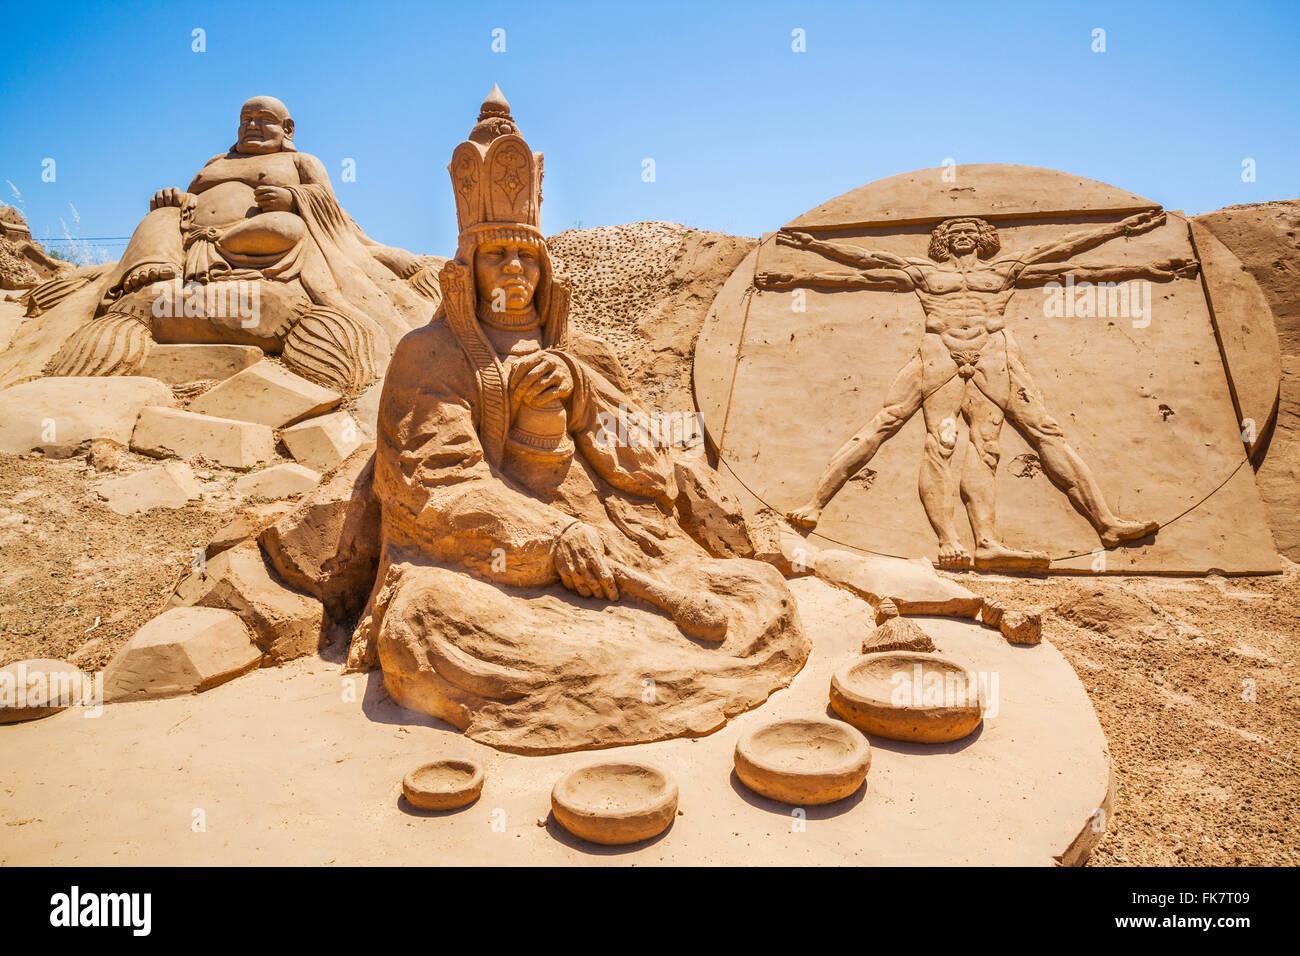 Portugal, Algarve, Faro distrikt, Pera, FIESA International Sand Festival, sand sculptures with the 2013 theme of - Stock Image